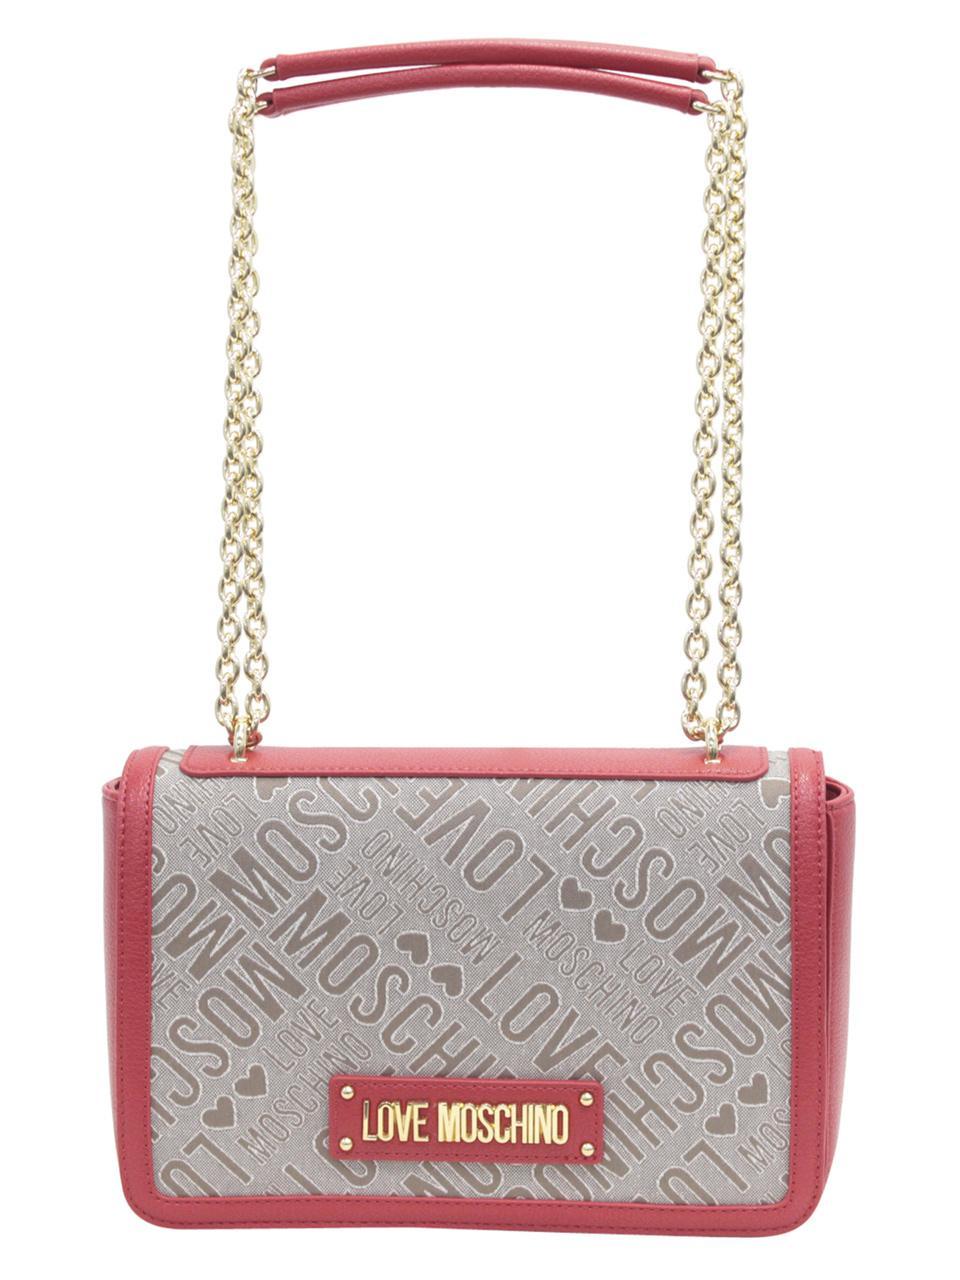 77ef4ae3edc0 Love Moschino Women s Logo Print Shoulder Handbag by Love Moschino. Touch  to zoom